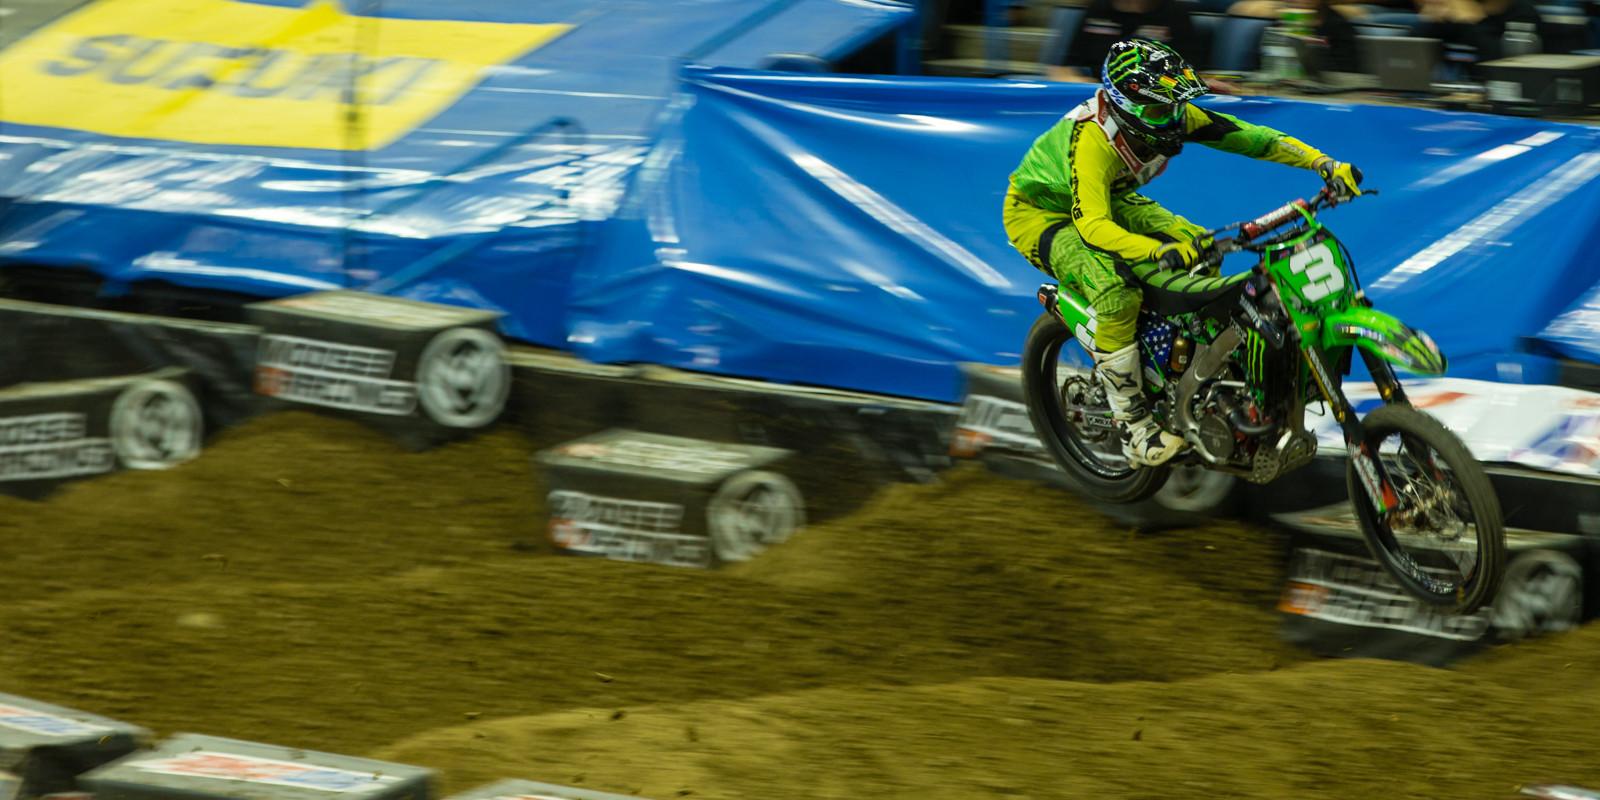 Gavin Faith - Photo Gallery: Ontario Arenacross - Saturday Night - Motocross Pictures - Vital MX